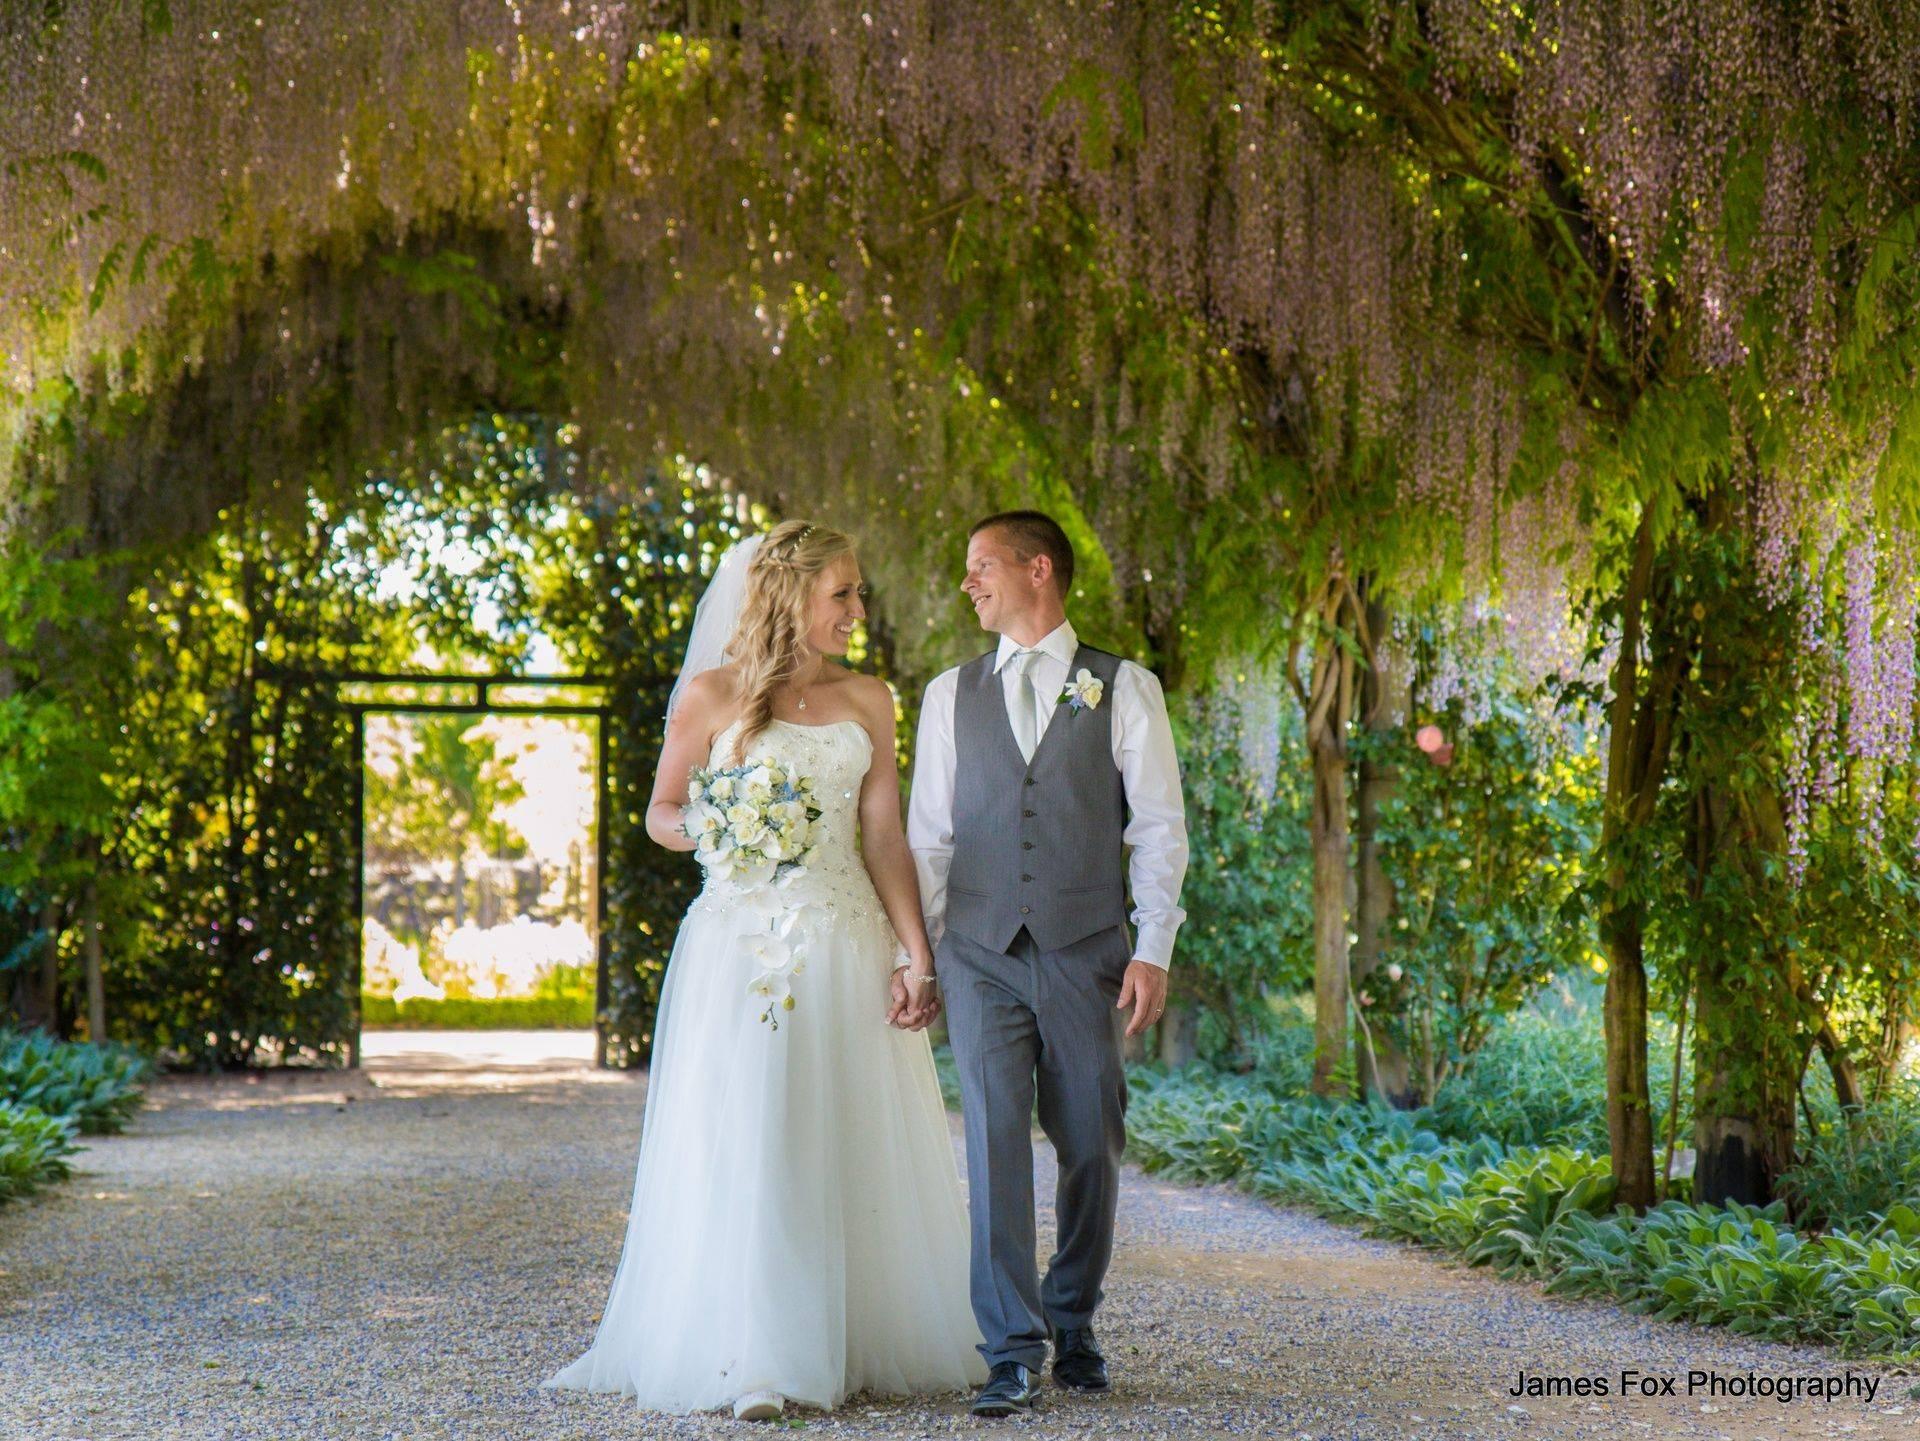 James Fox Wedding Photography